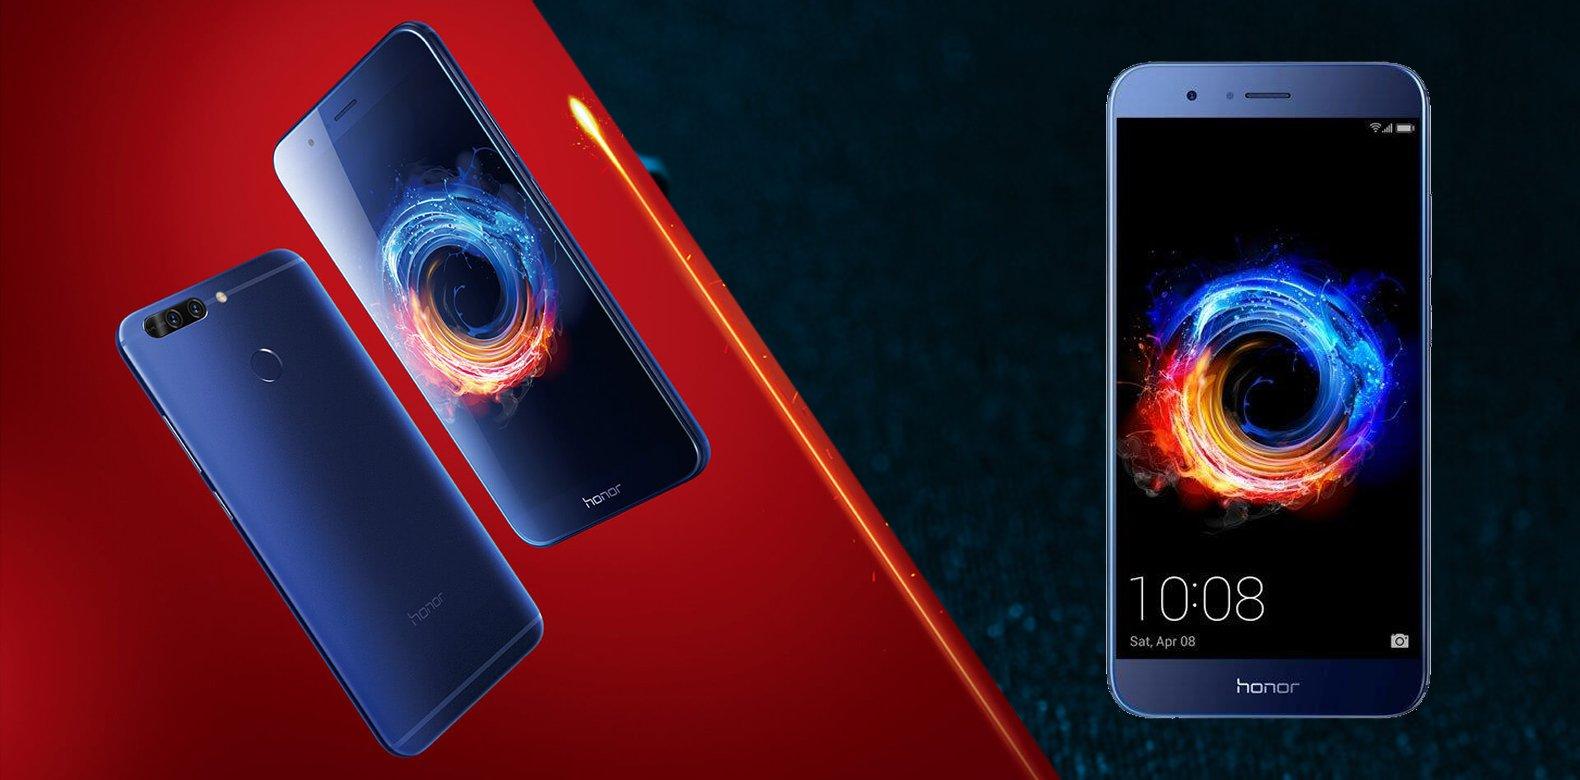 Huawei Honor 8 Pro emui 5.1